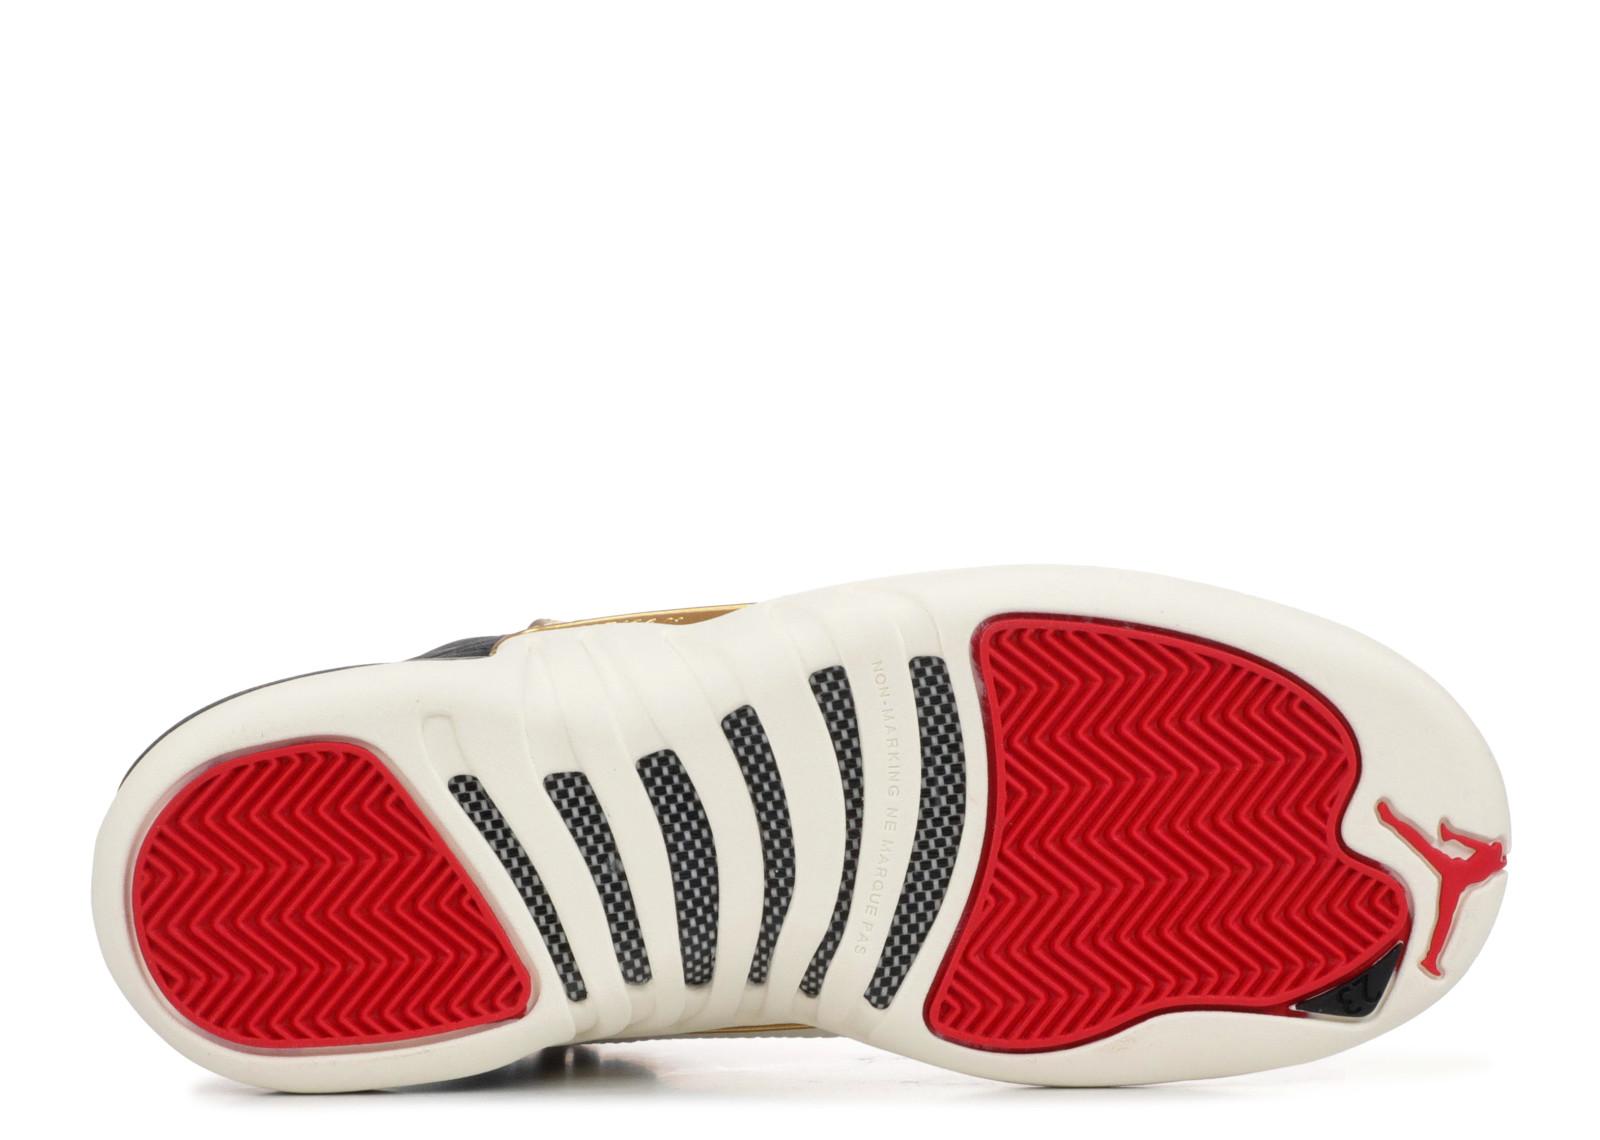 on sale f185a 6e7bb Kick Avenue - Authentic Sneakers